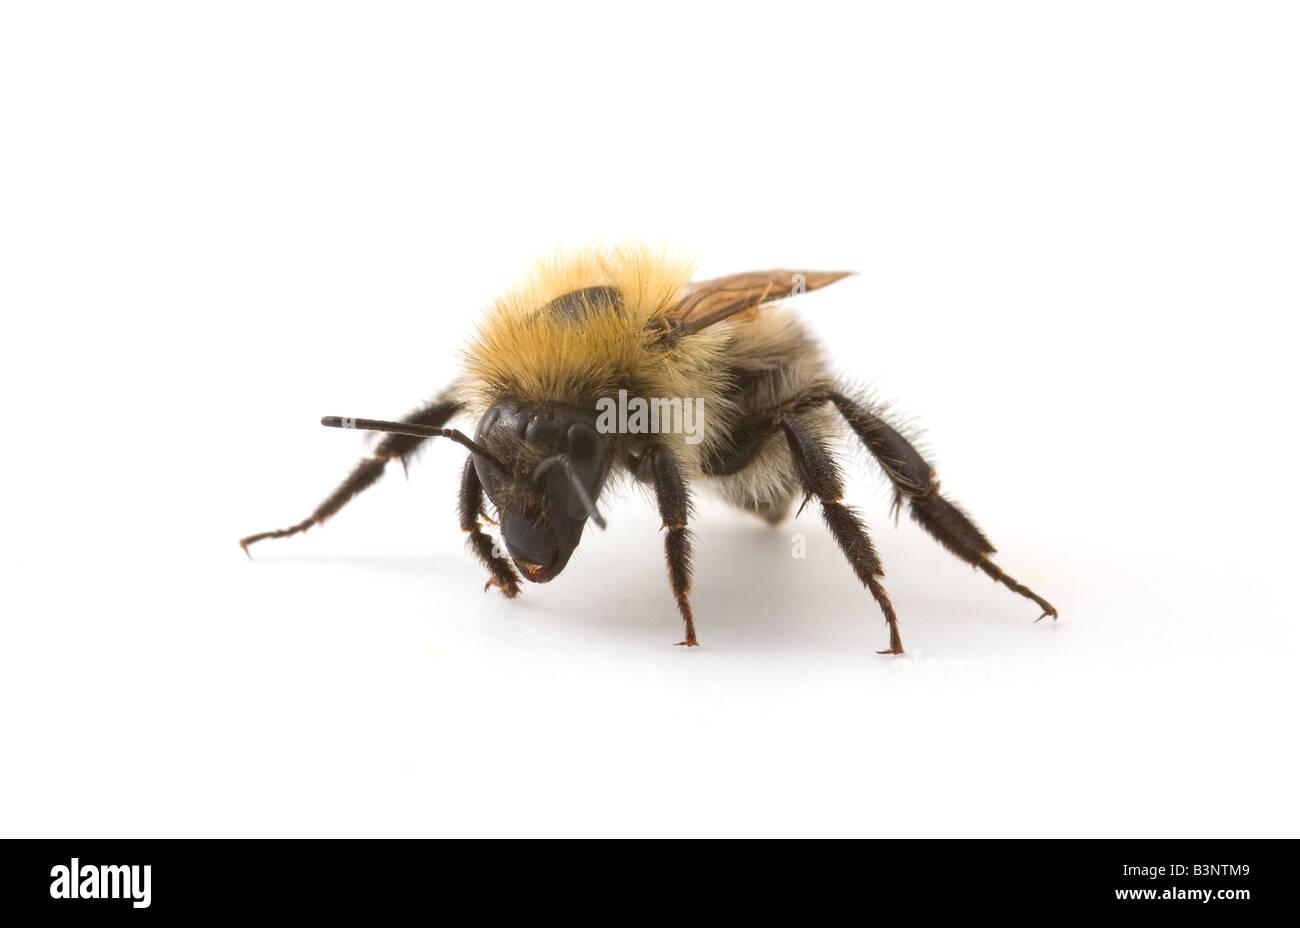 Studio shot of a Honey Bee, Apis mellifera. - Stock Image